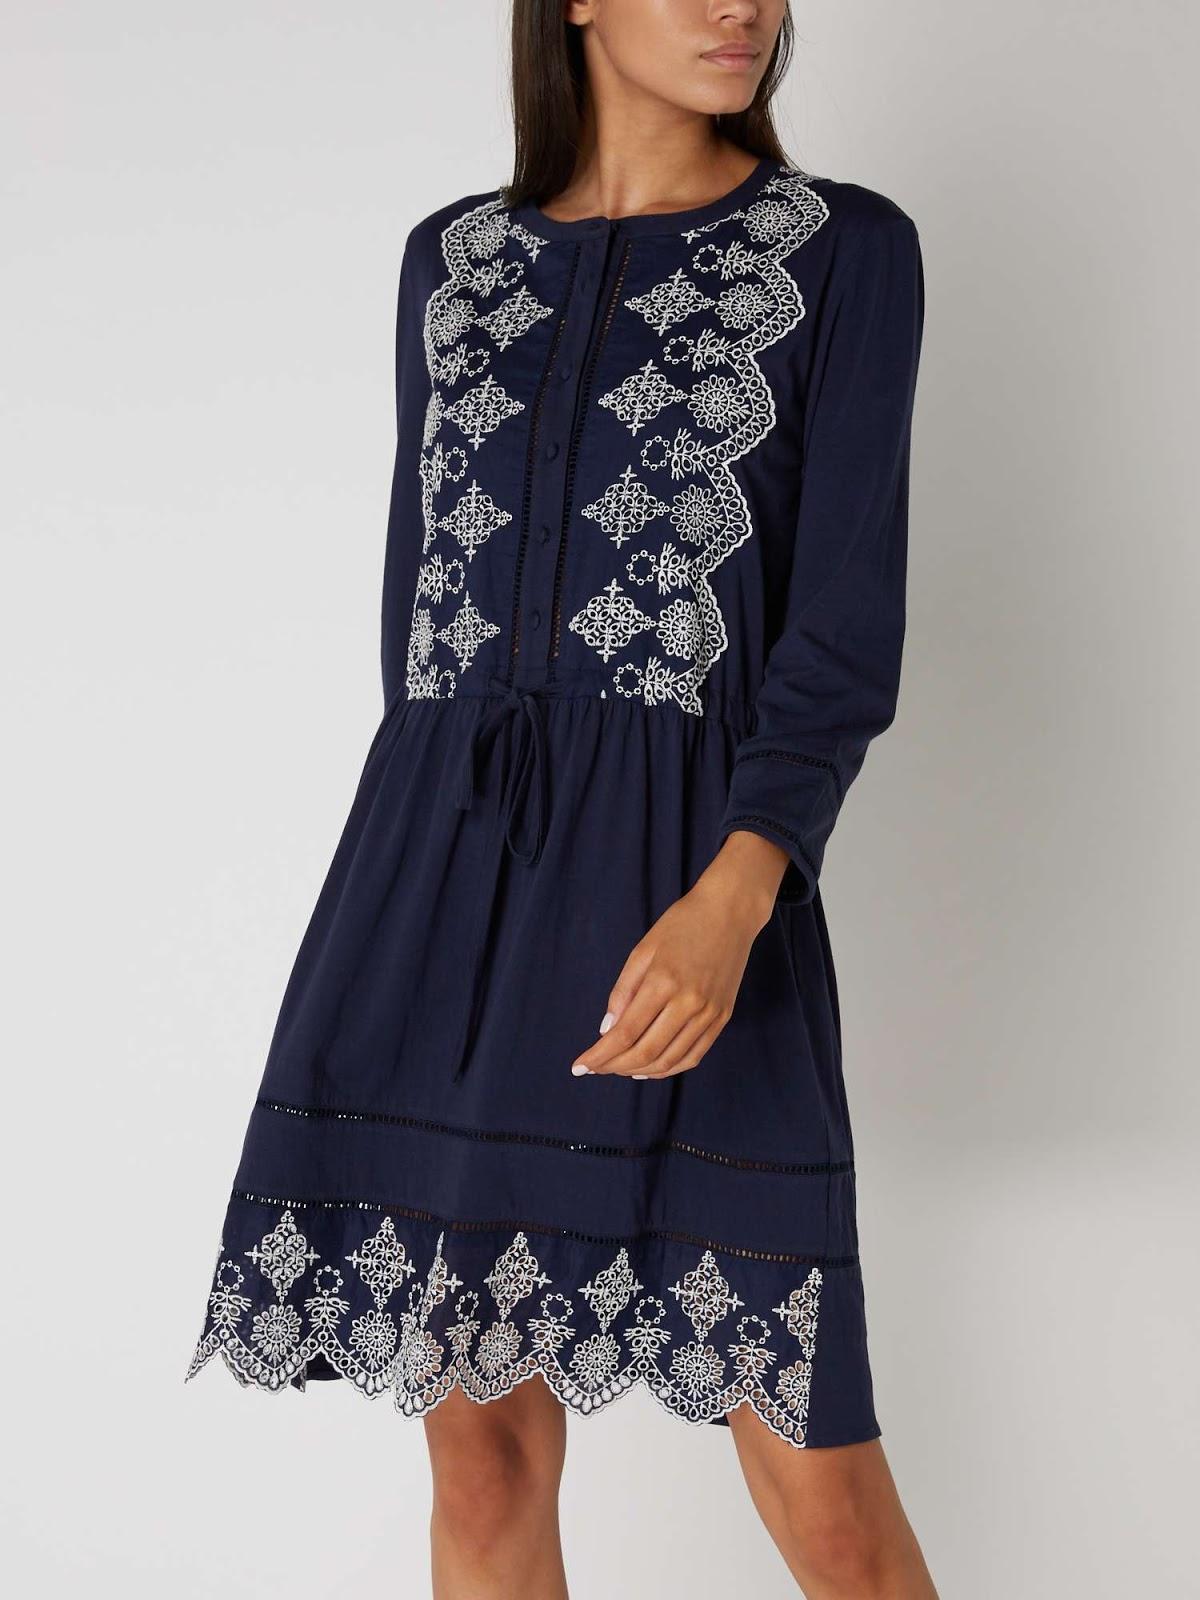 Maison De Nimes Embroidered Shirt Dress